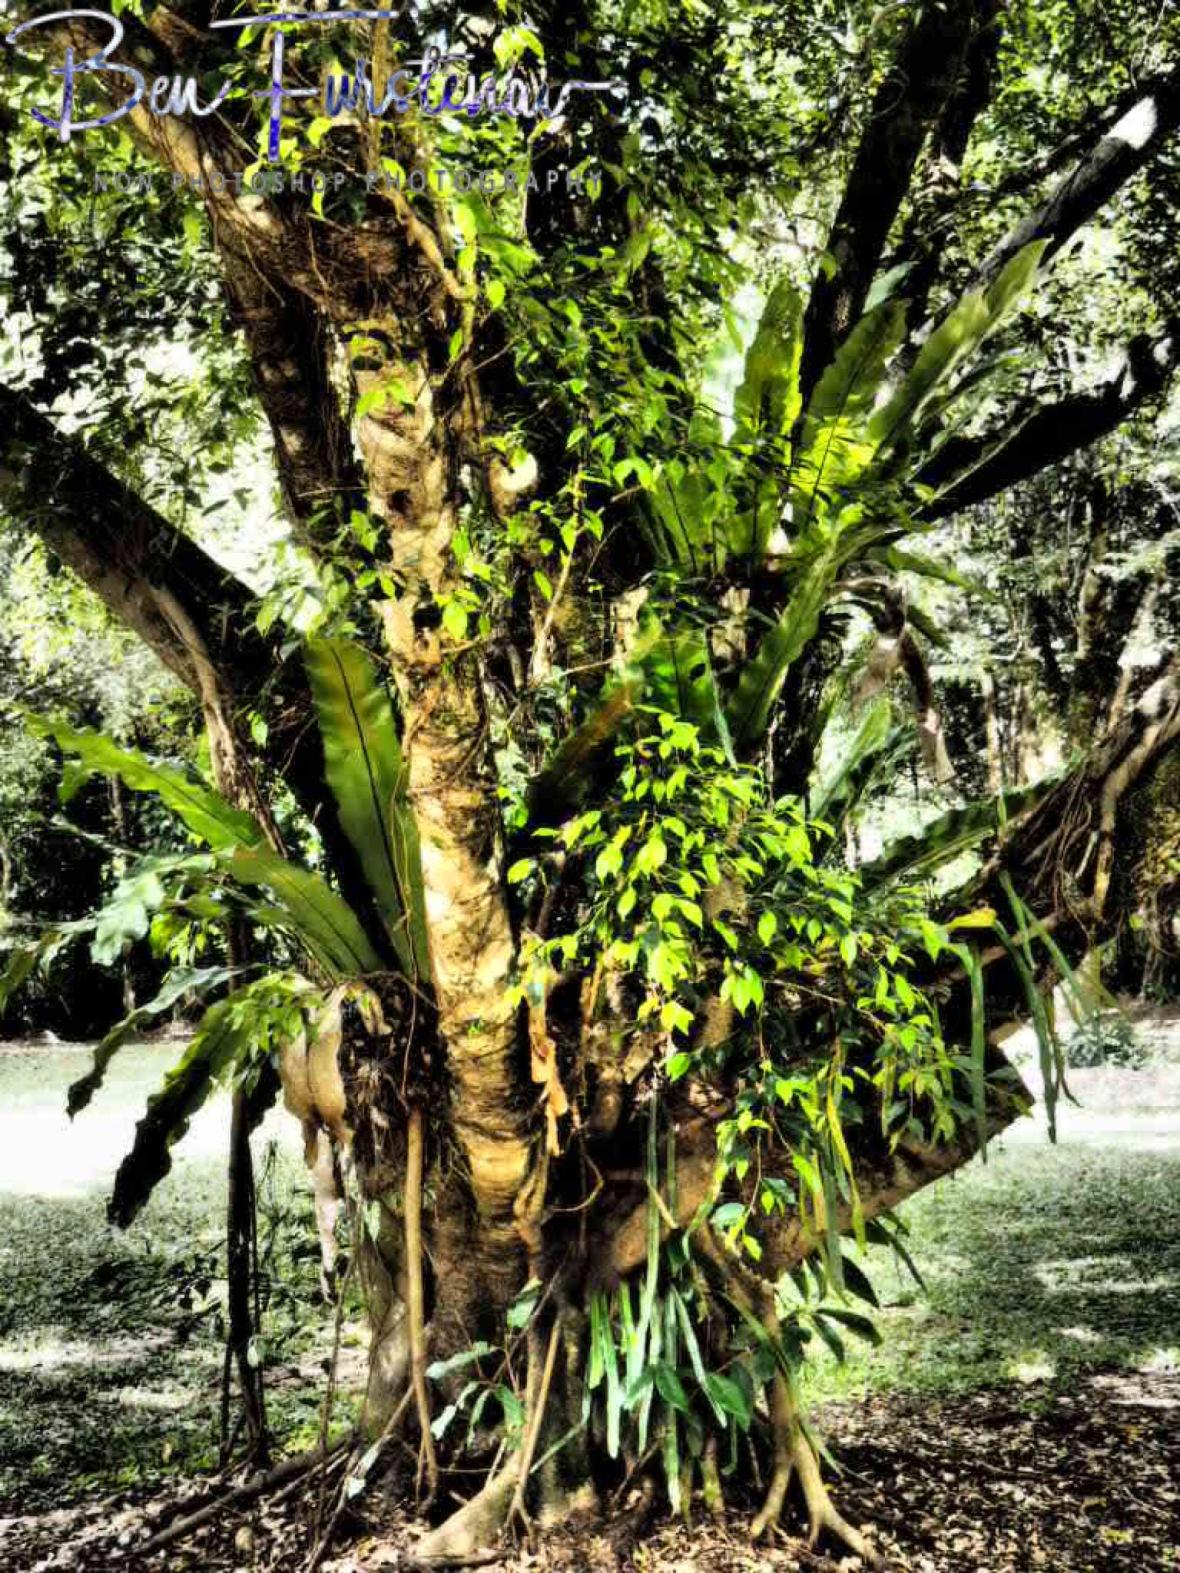 Natural life support at Babinda, Tropical Northern Queensland, Australia